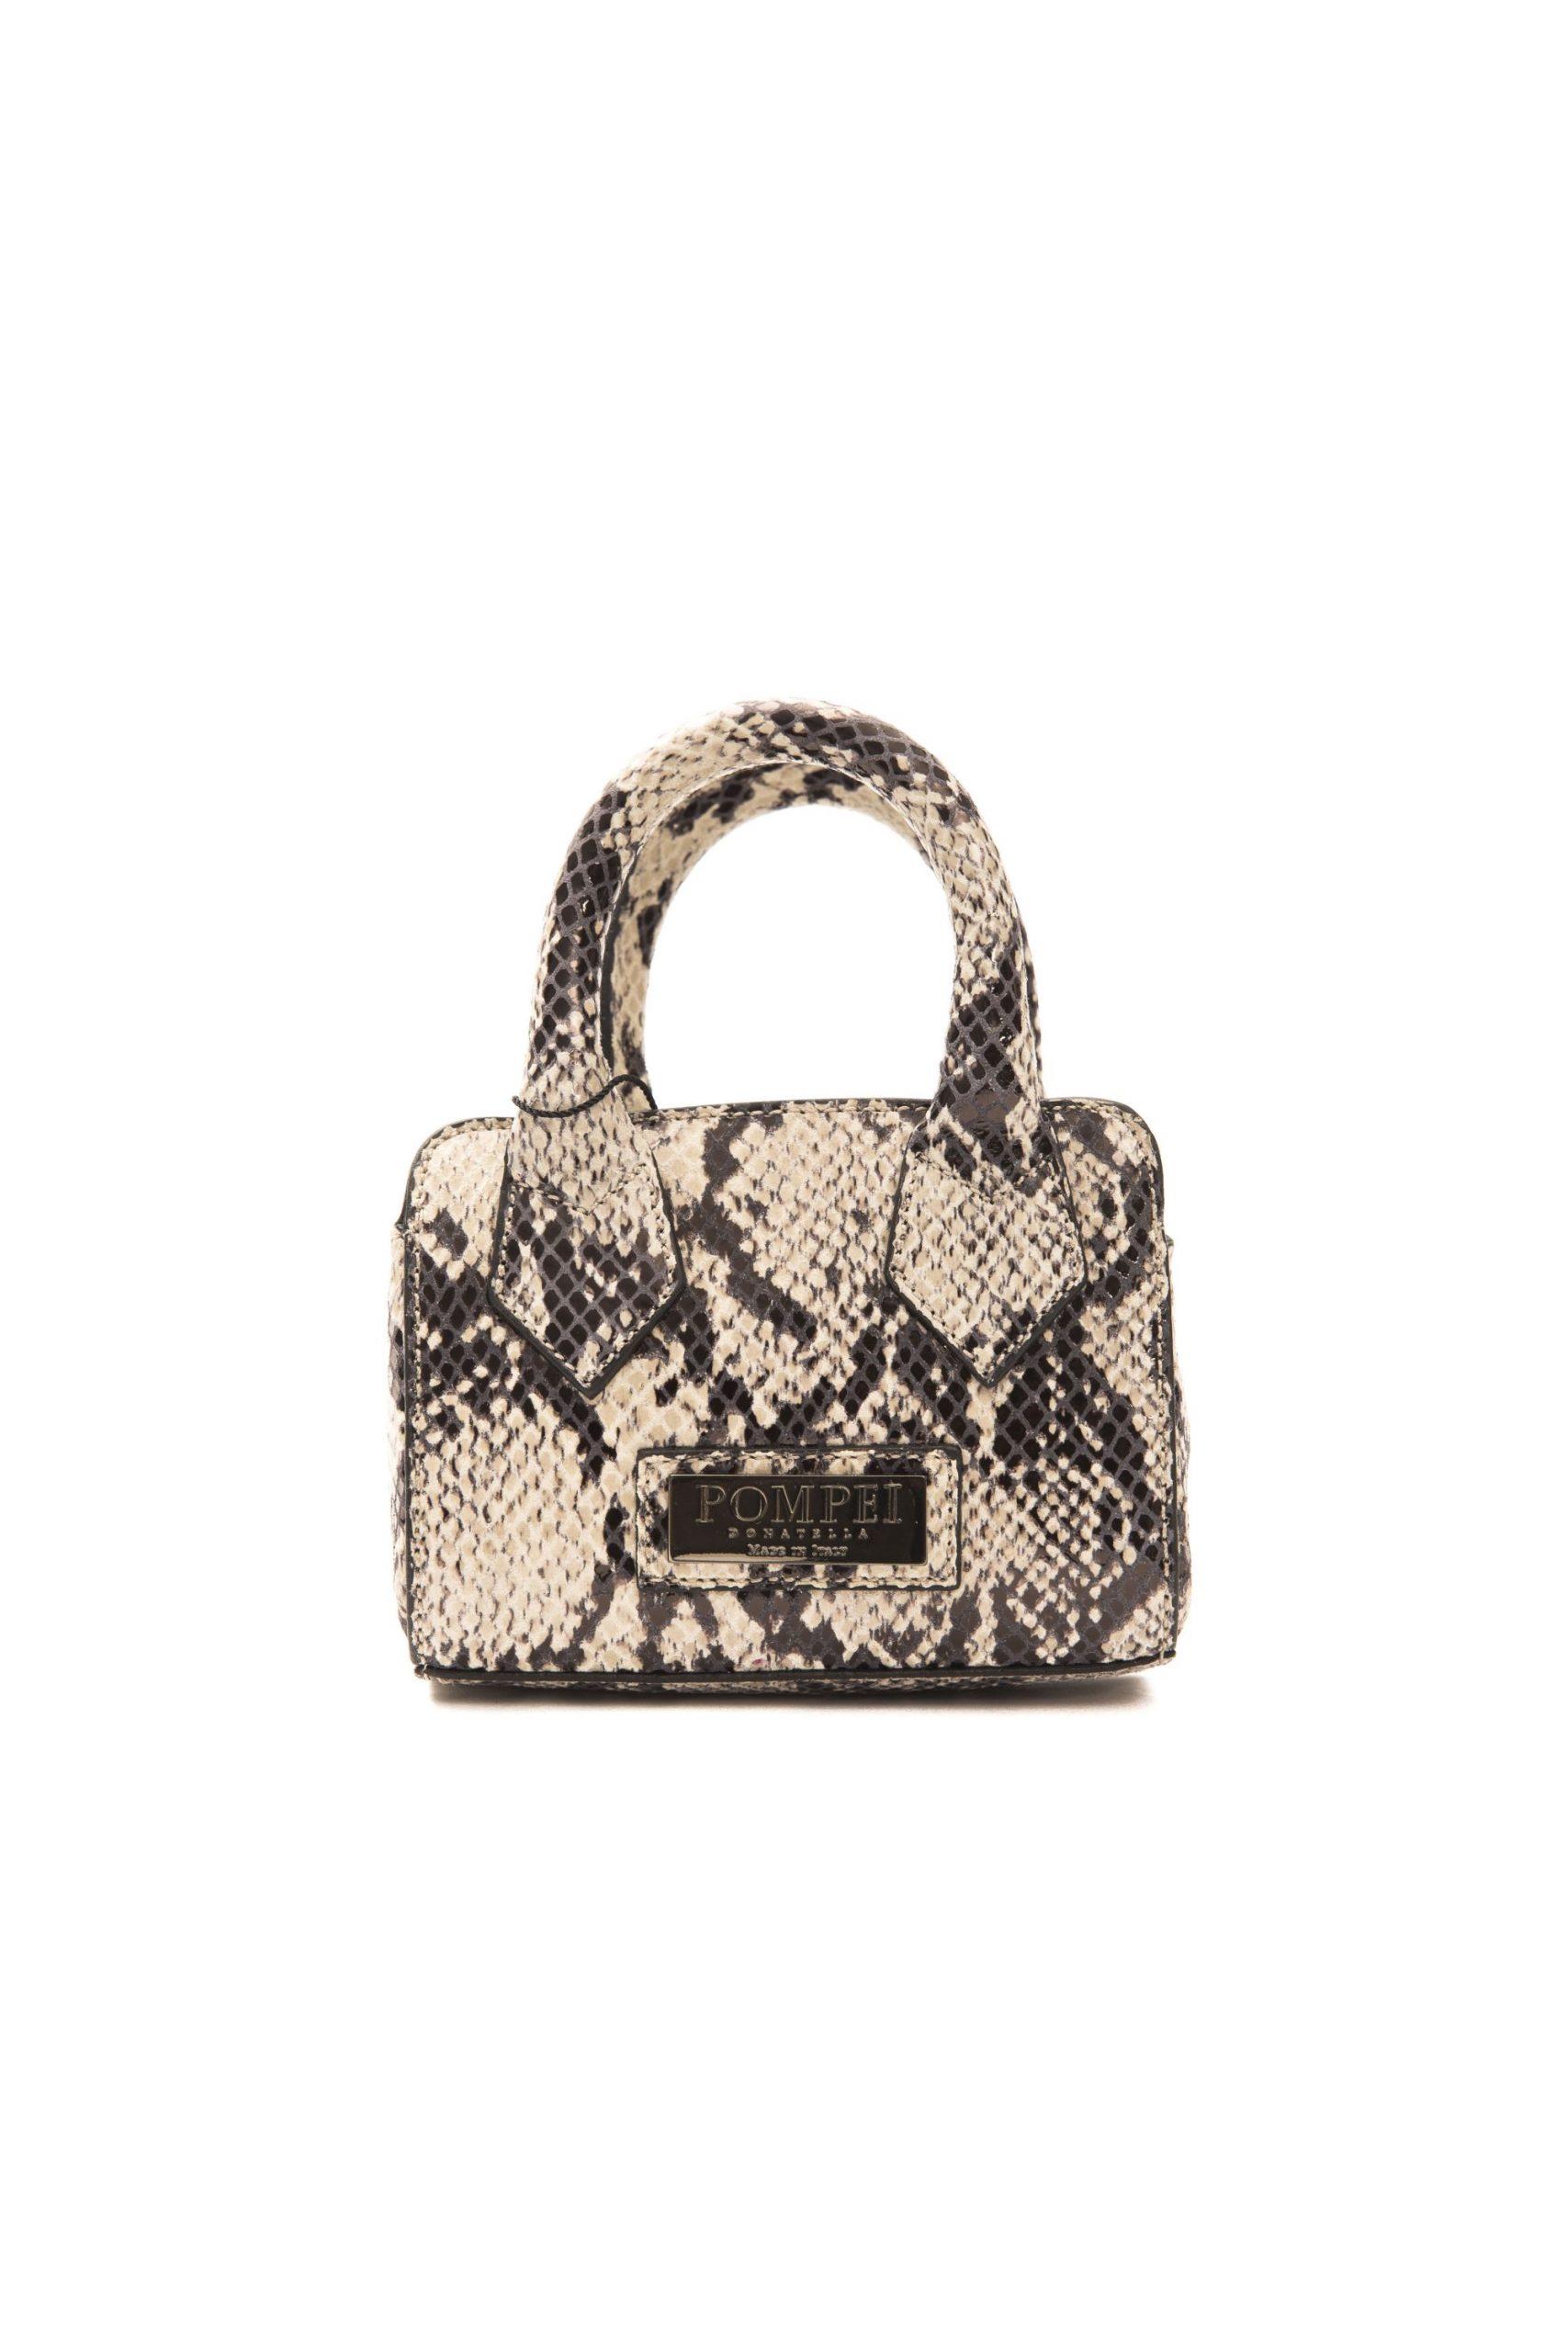 Pompei Donatella Women's Handbag Grey PO667794